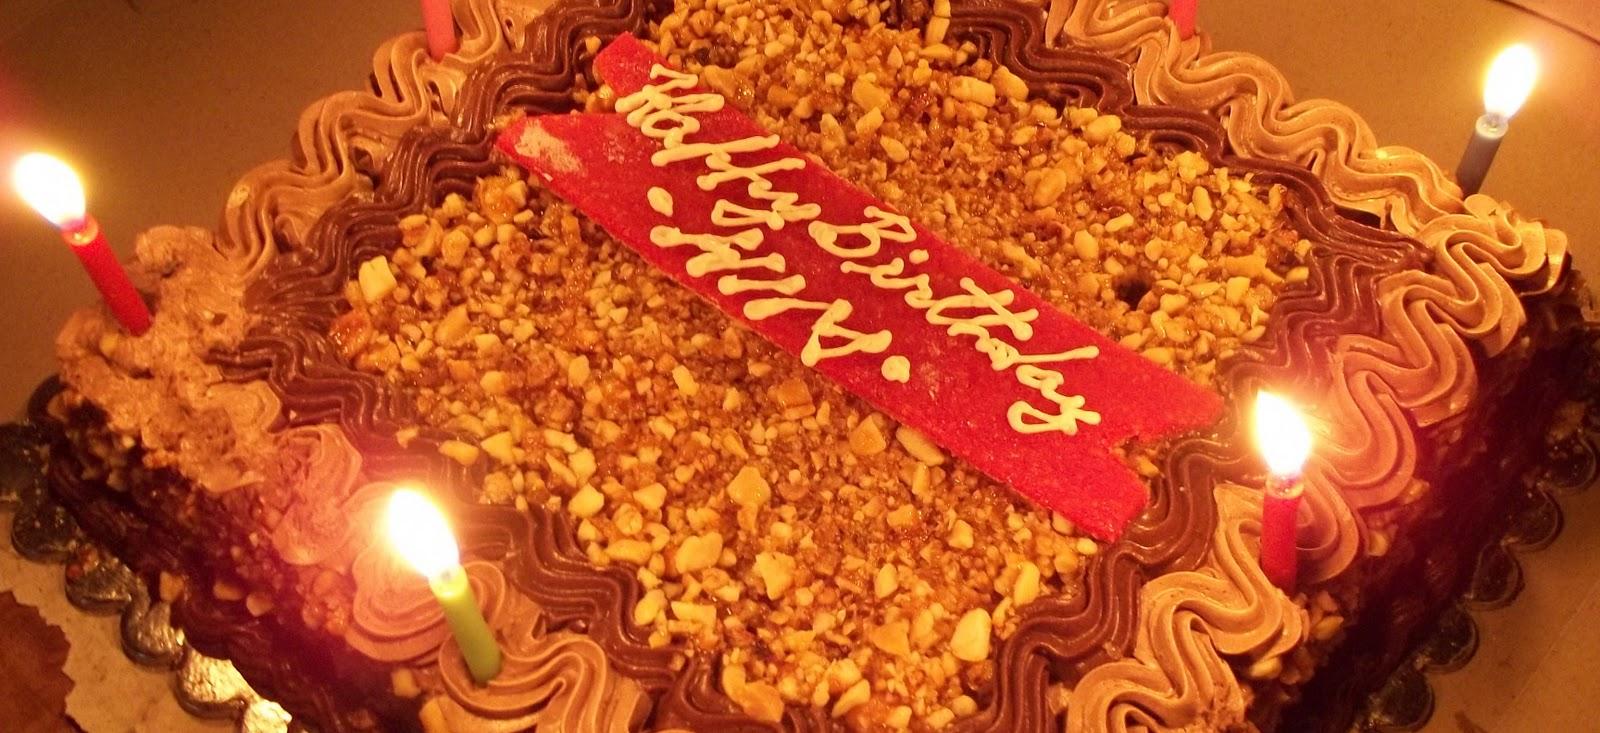 Cake Images Himanshu : Emoverse!!: Cake: My Friend s Birthday... Yummy!